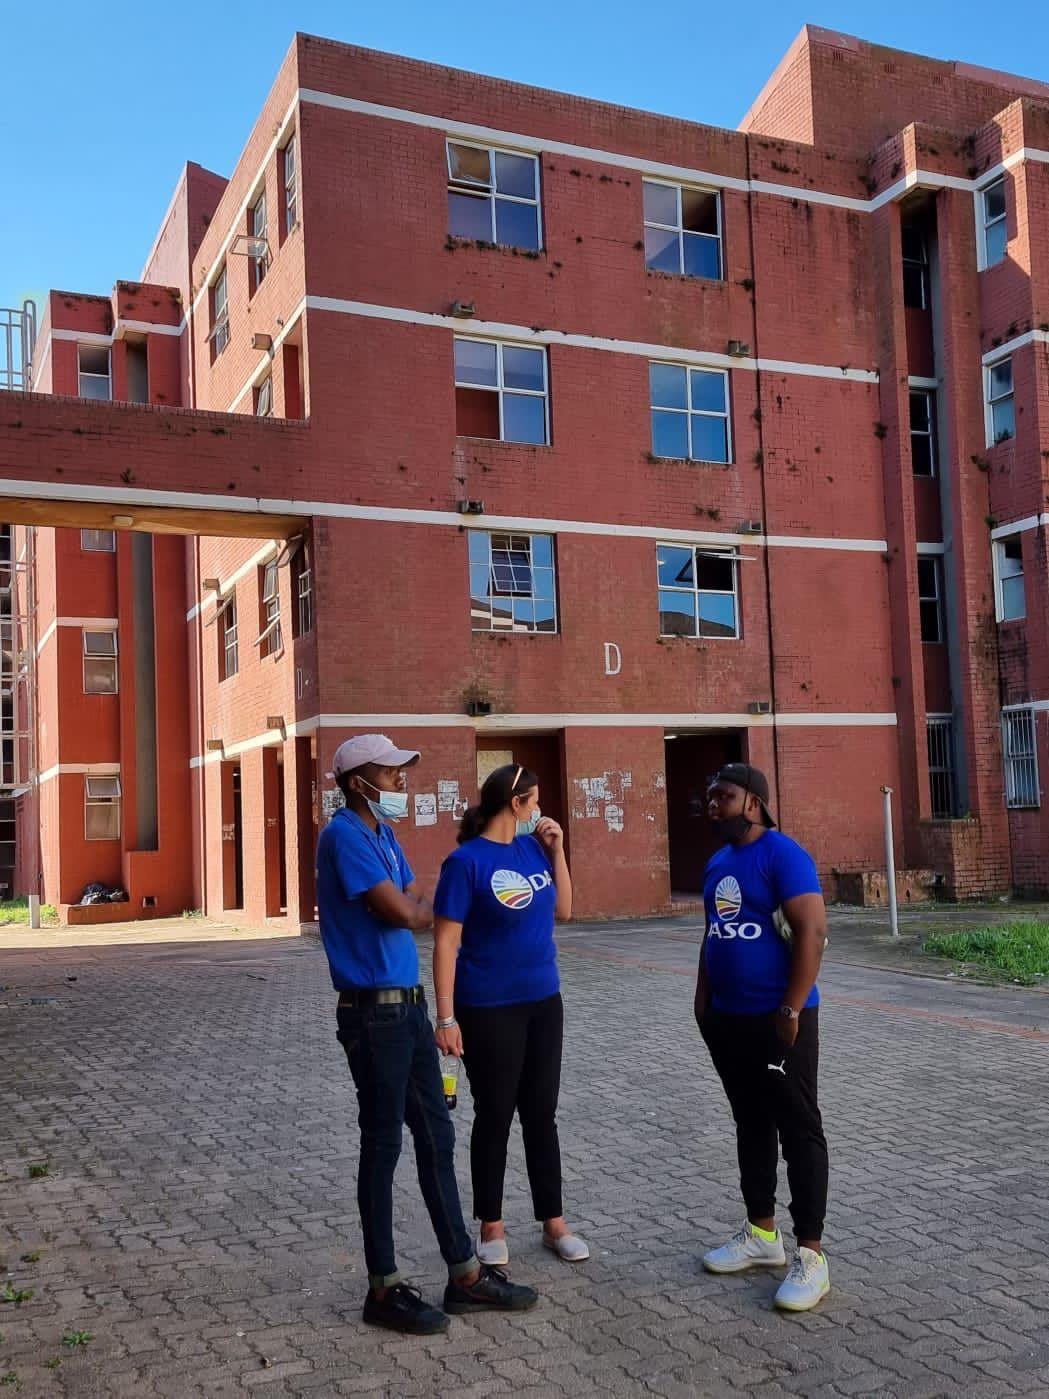 DASO KZN calls on Minister Blade Nzimande to urgently intervene in UniZulu's poor living conditions